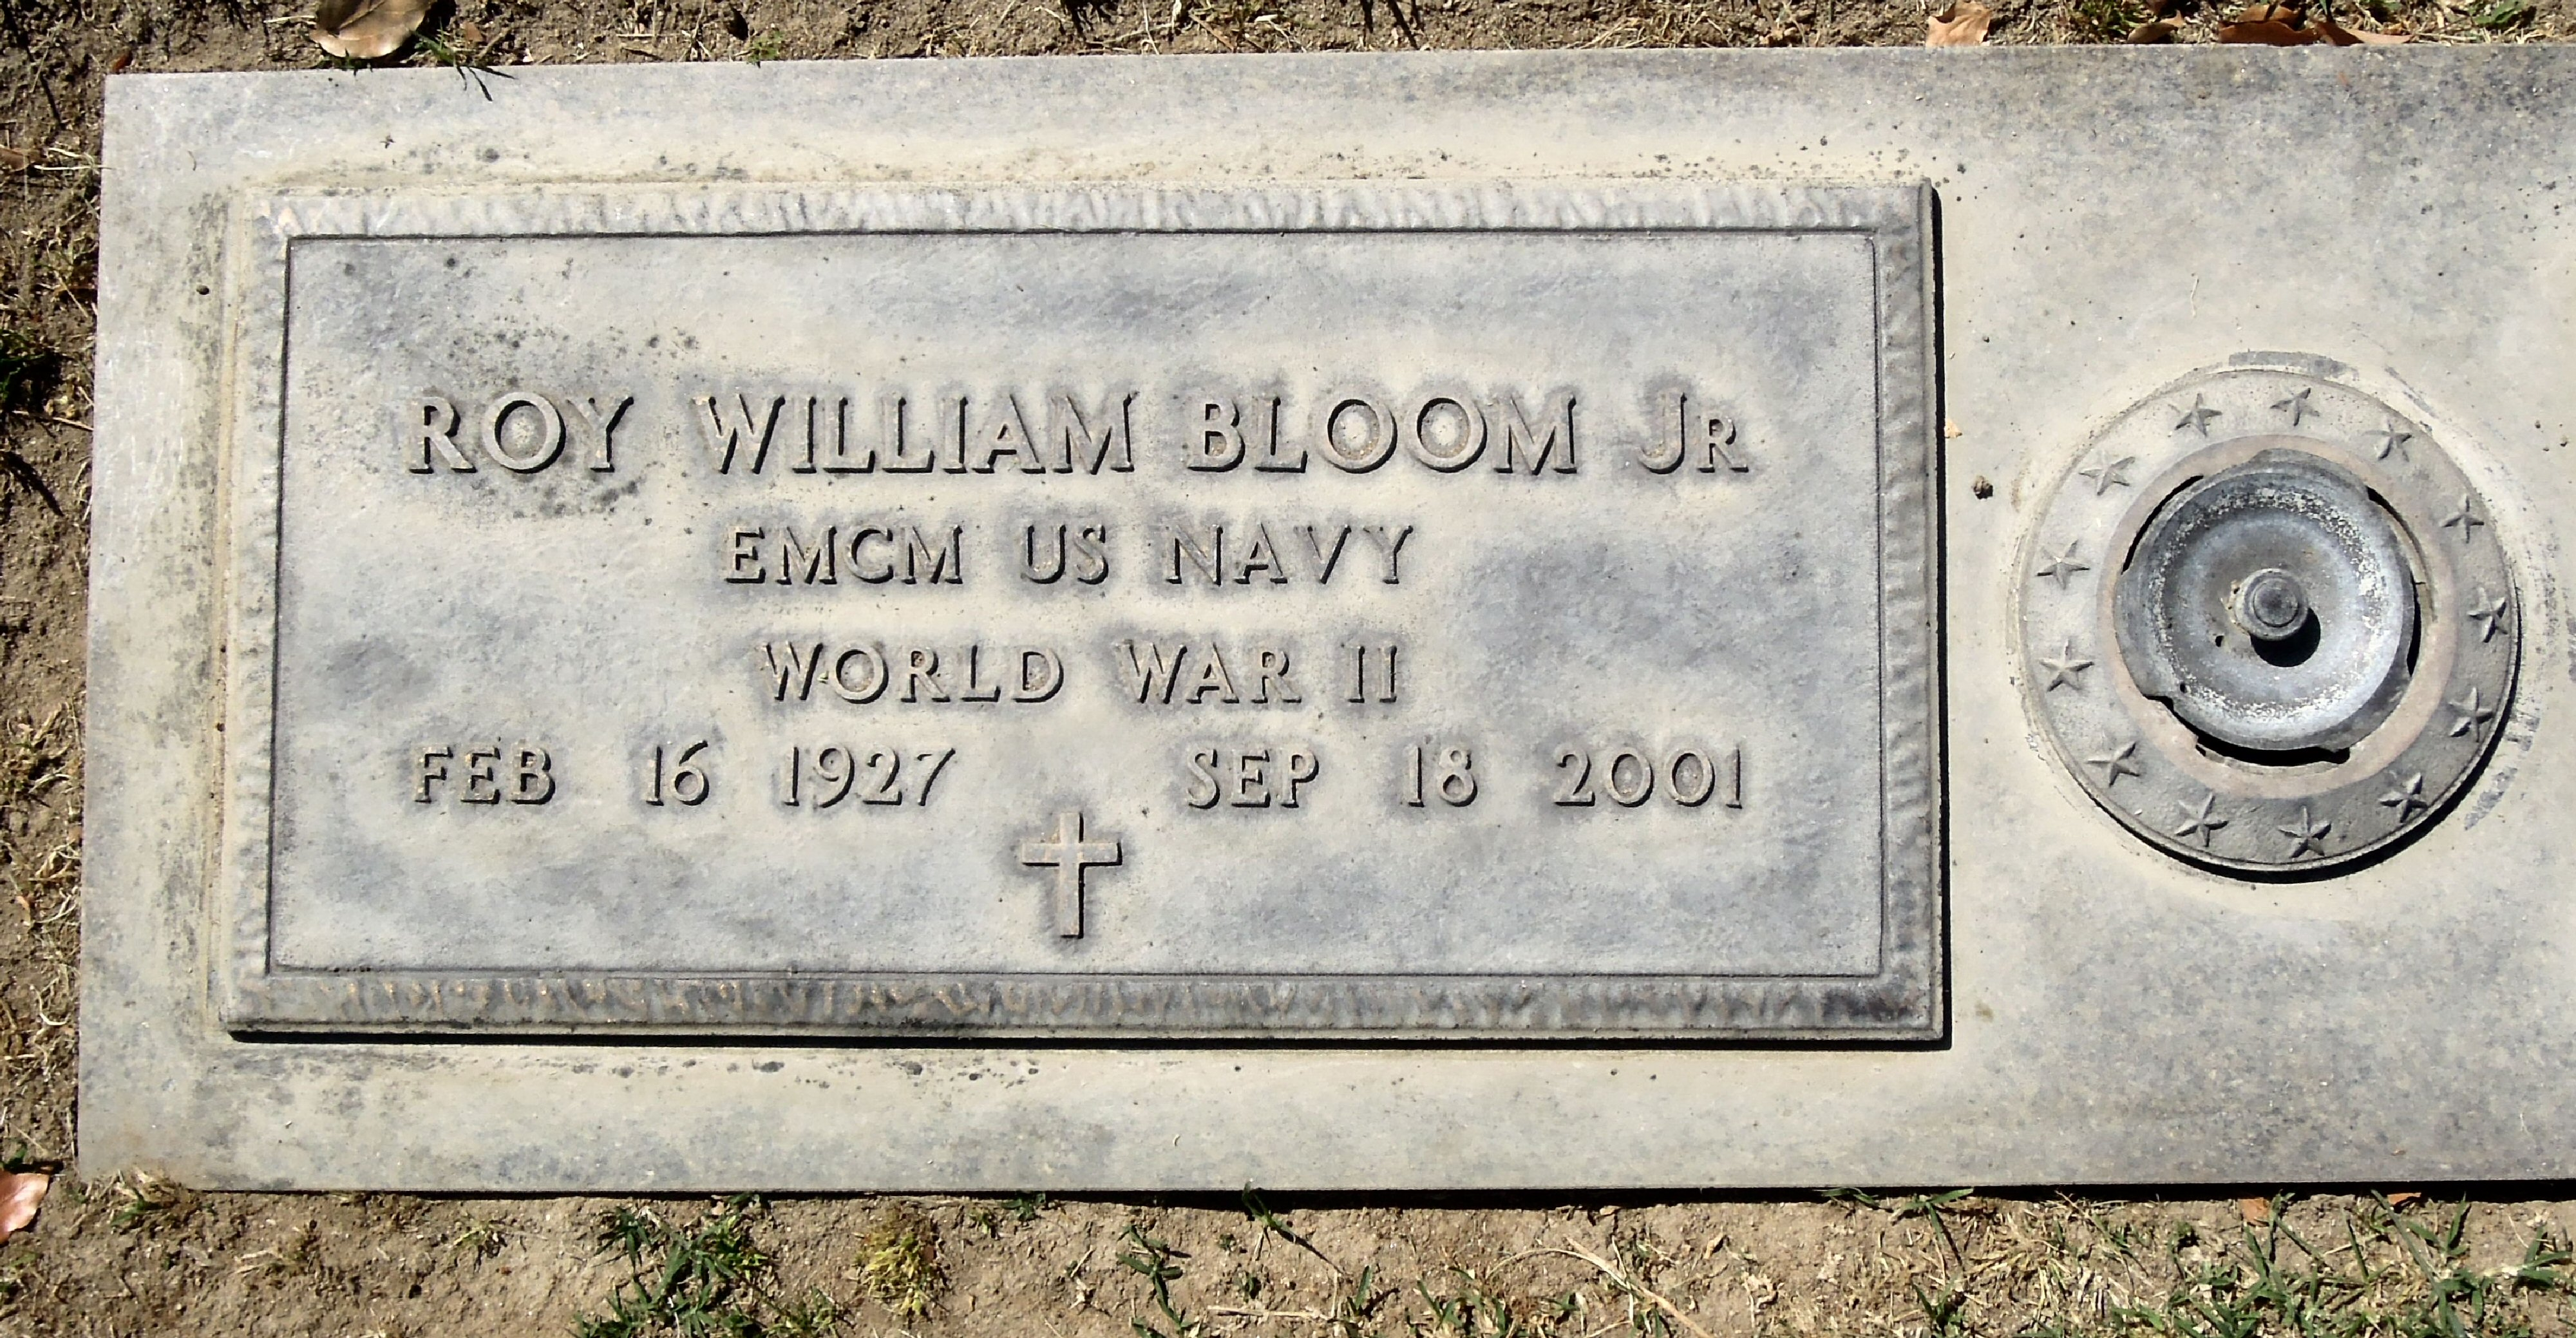 Roy William Bloom, Jr